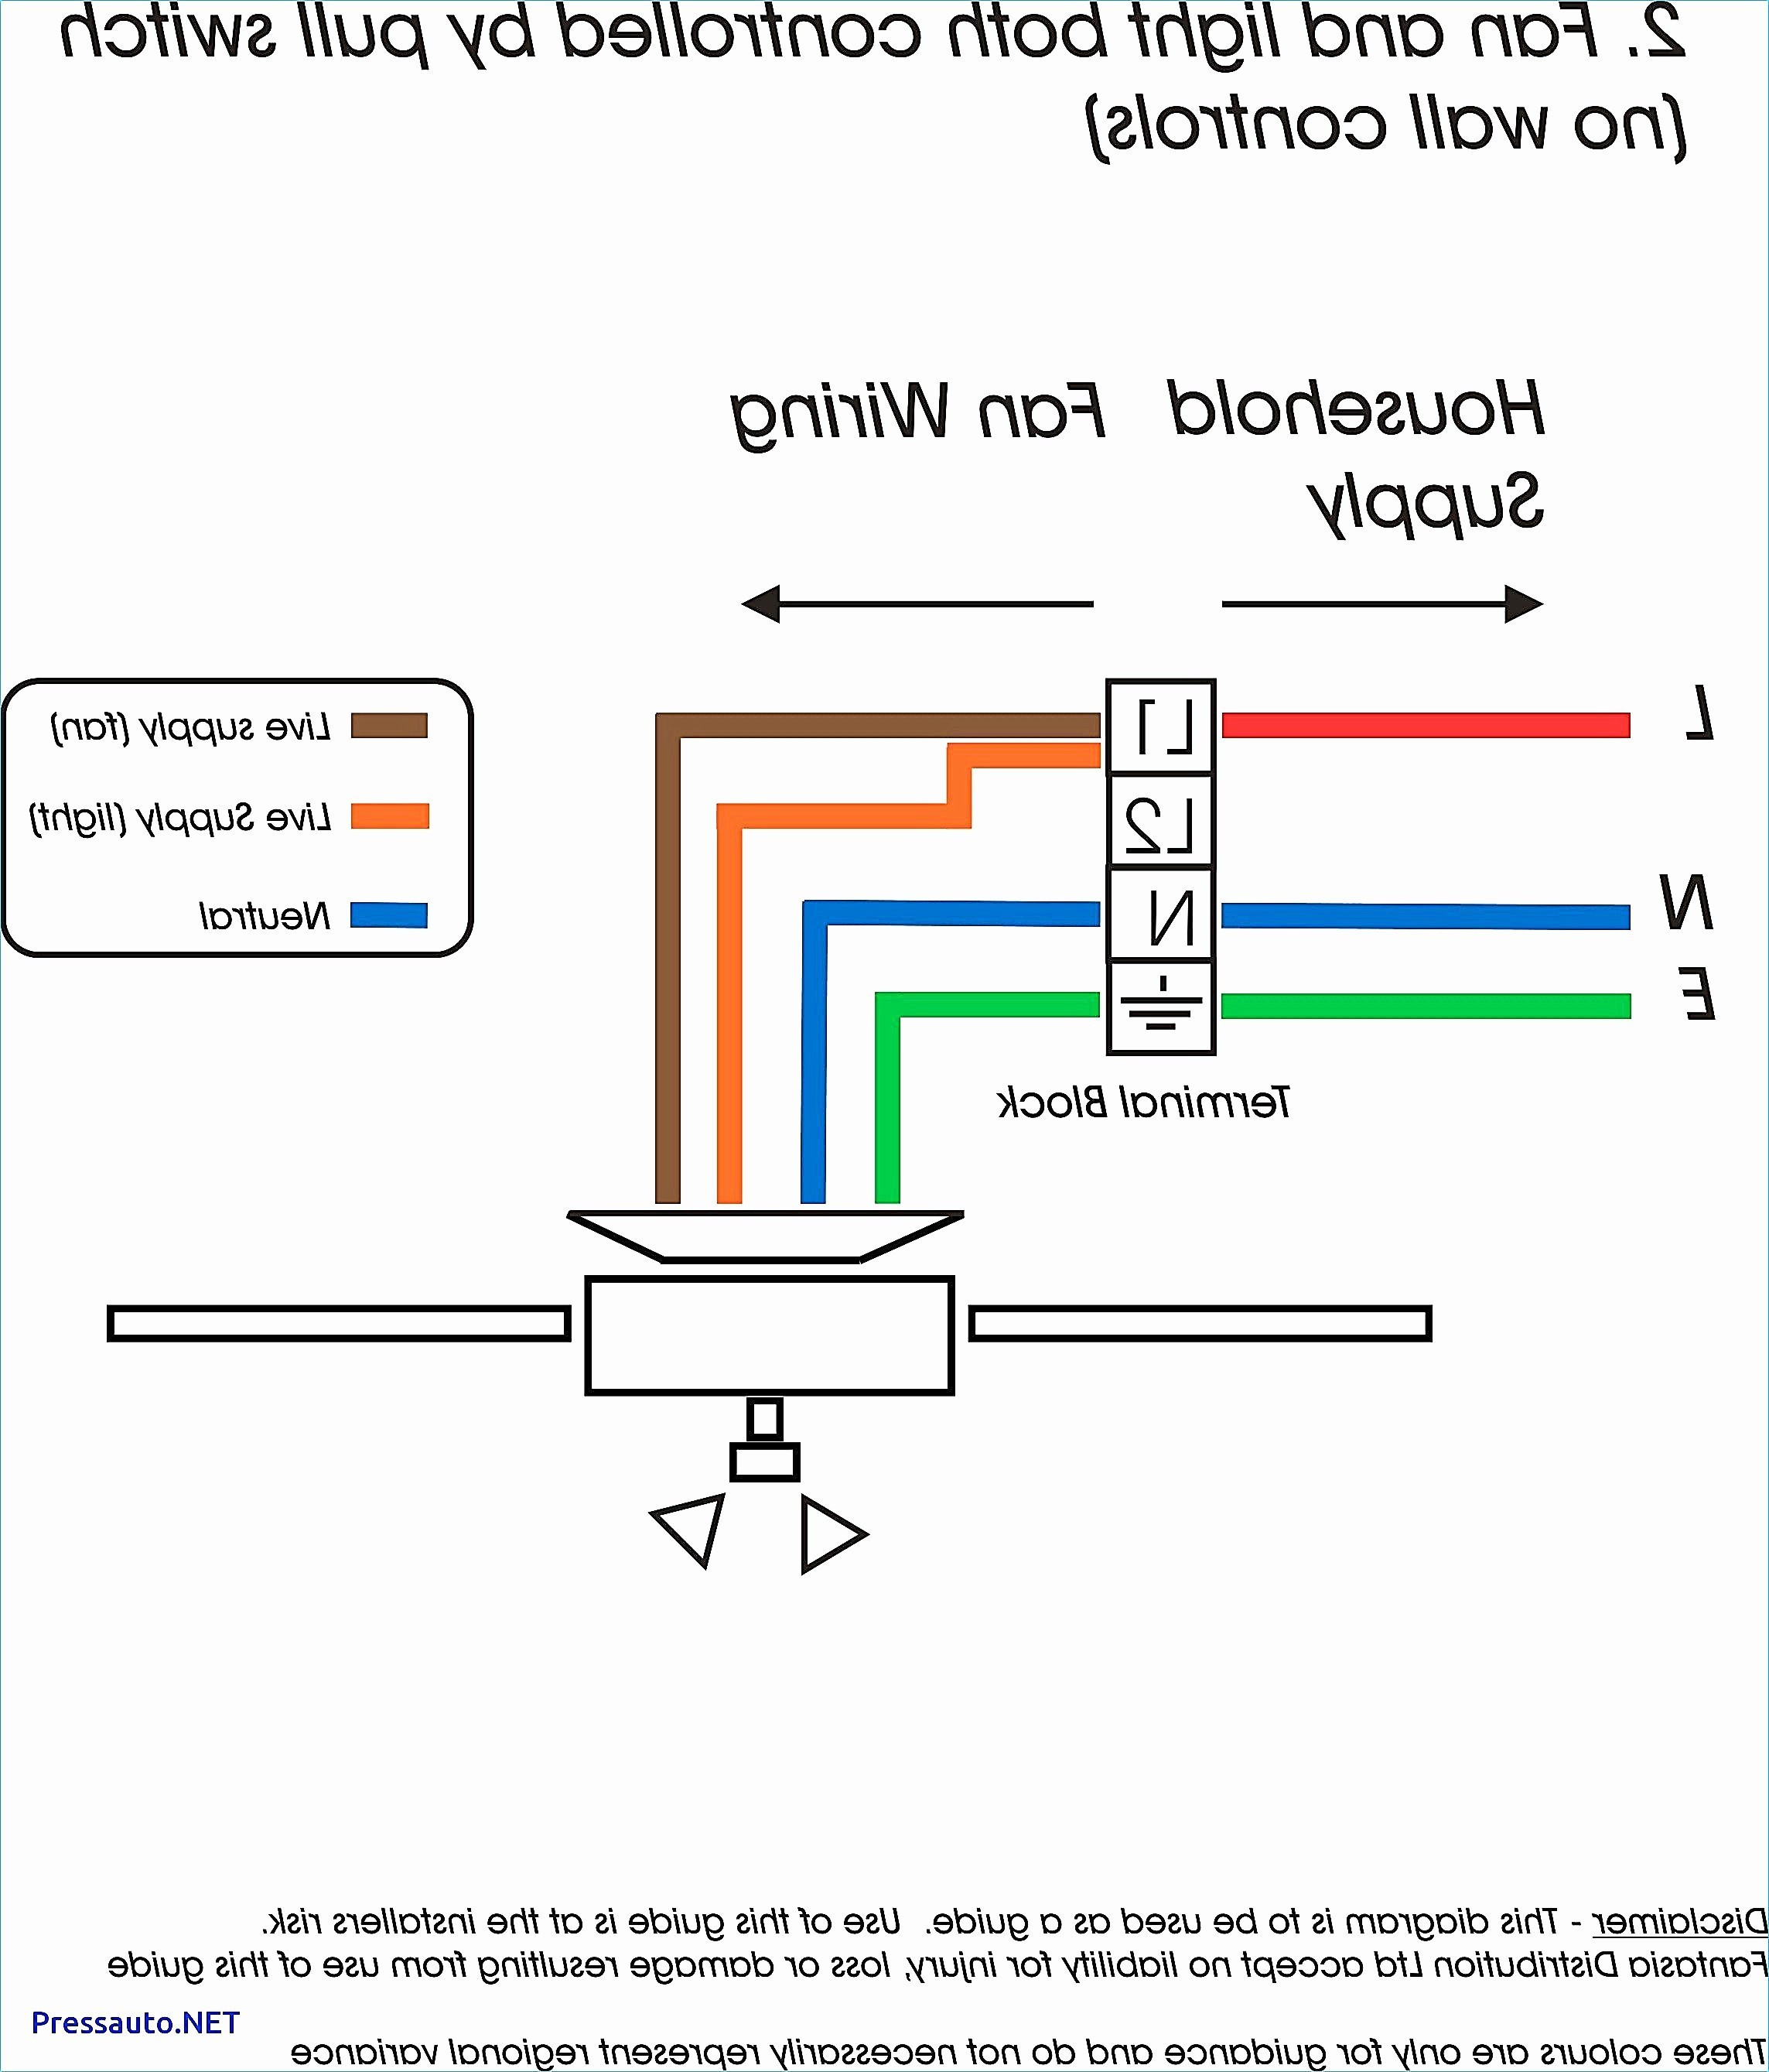 Massey Ferguson 135 Wiring Diagram Generator Best Wiring Diagram Stamford Alternator 2018 Wiring Diagram Stamford